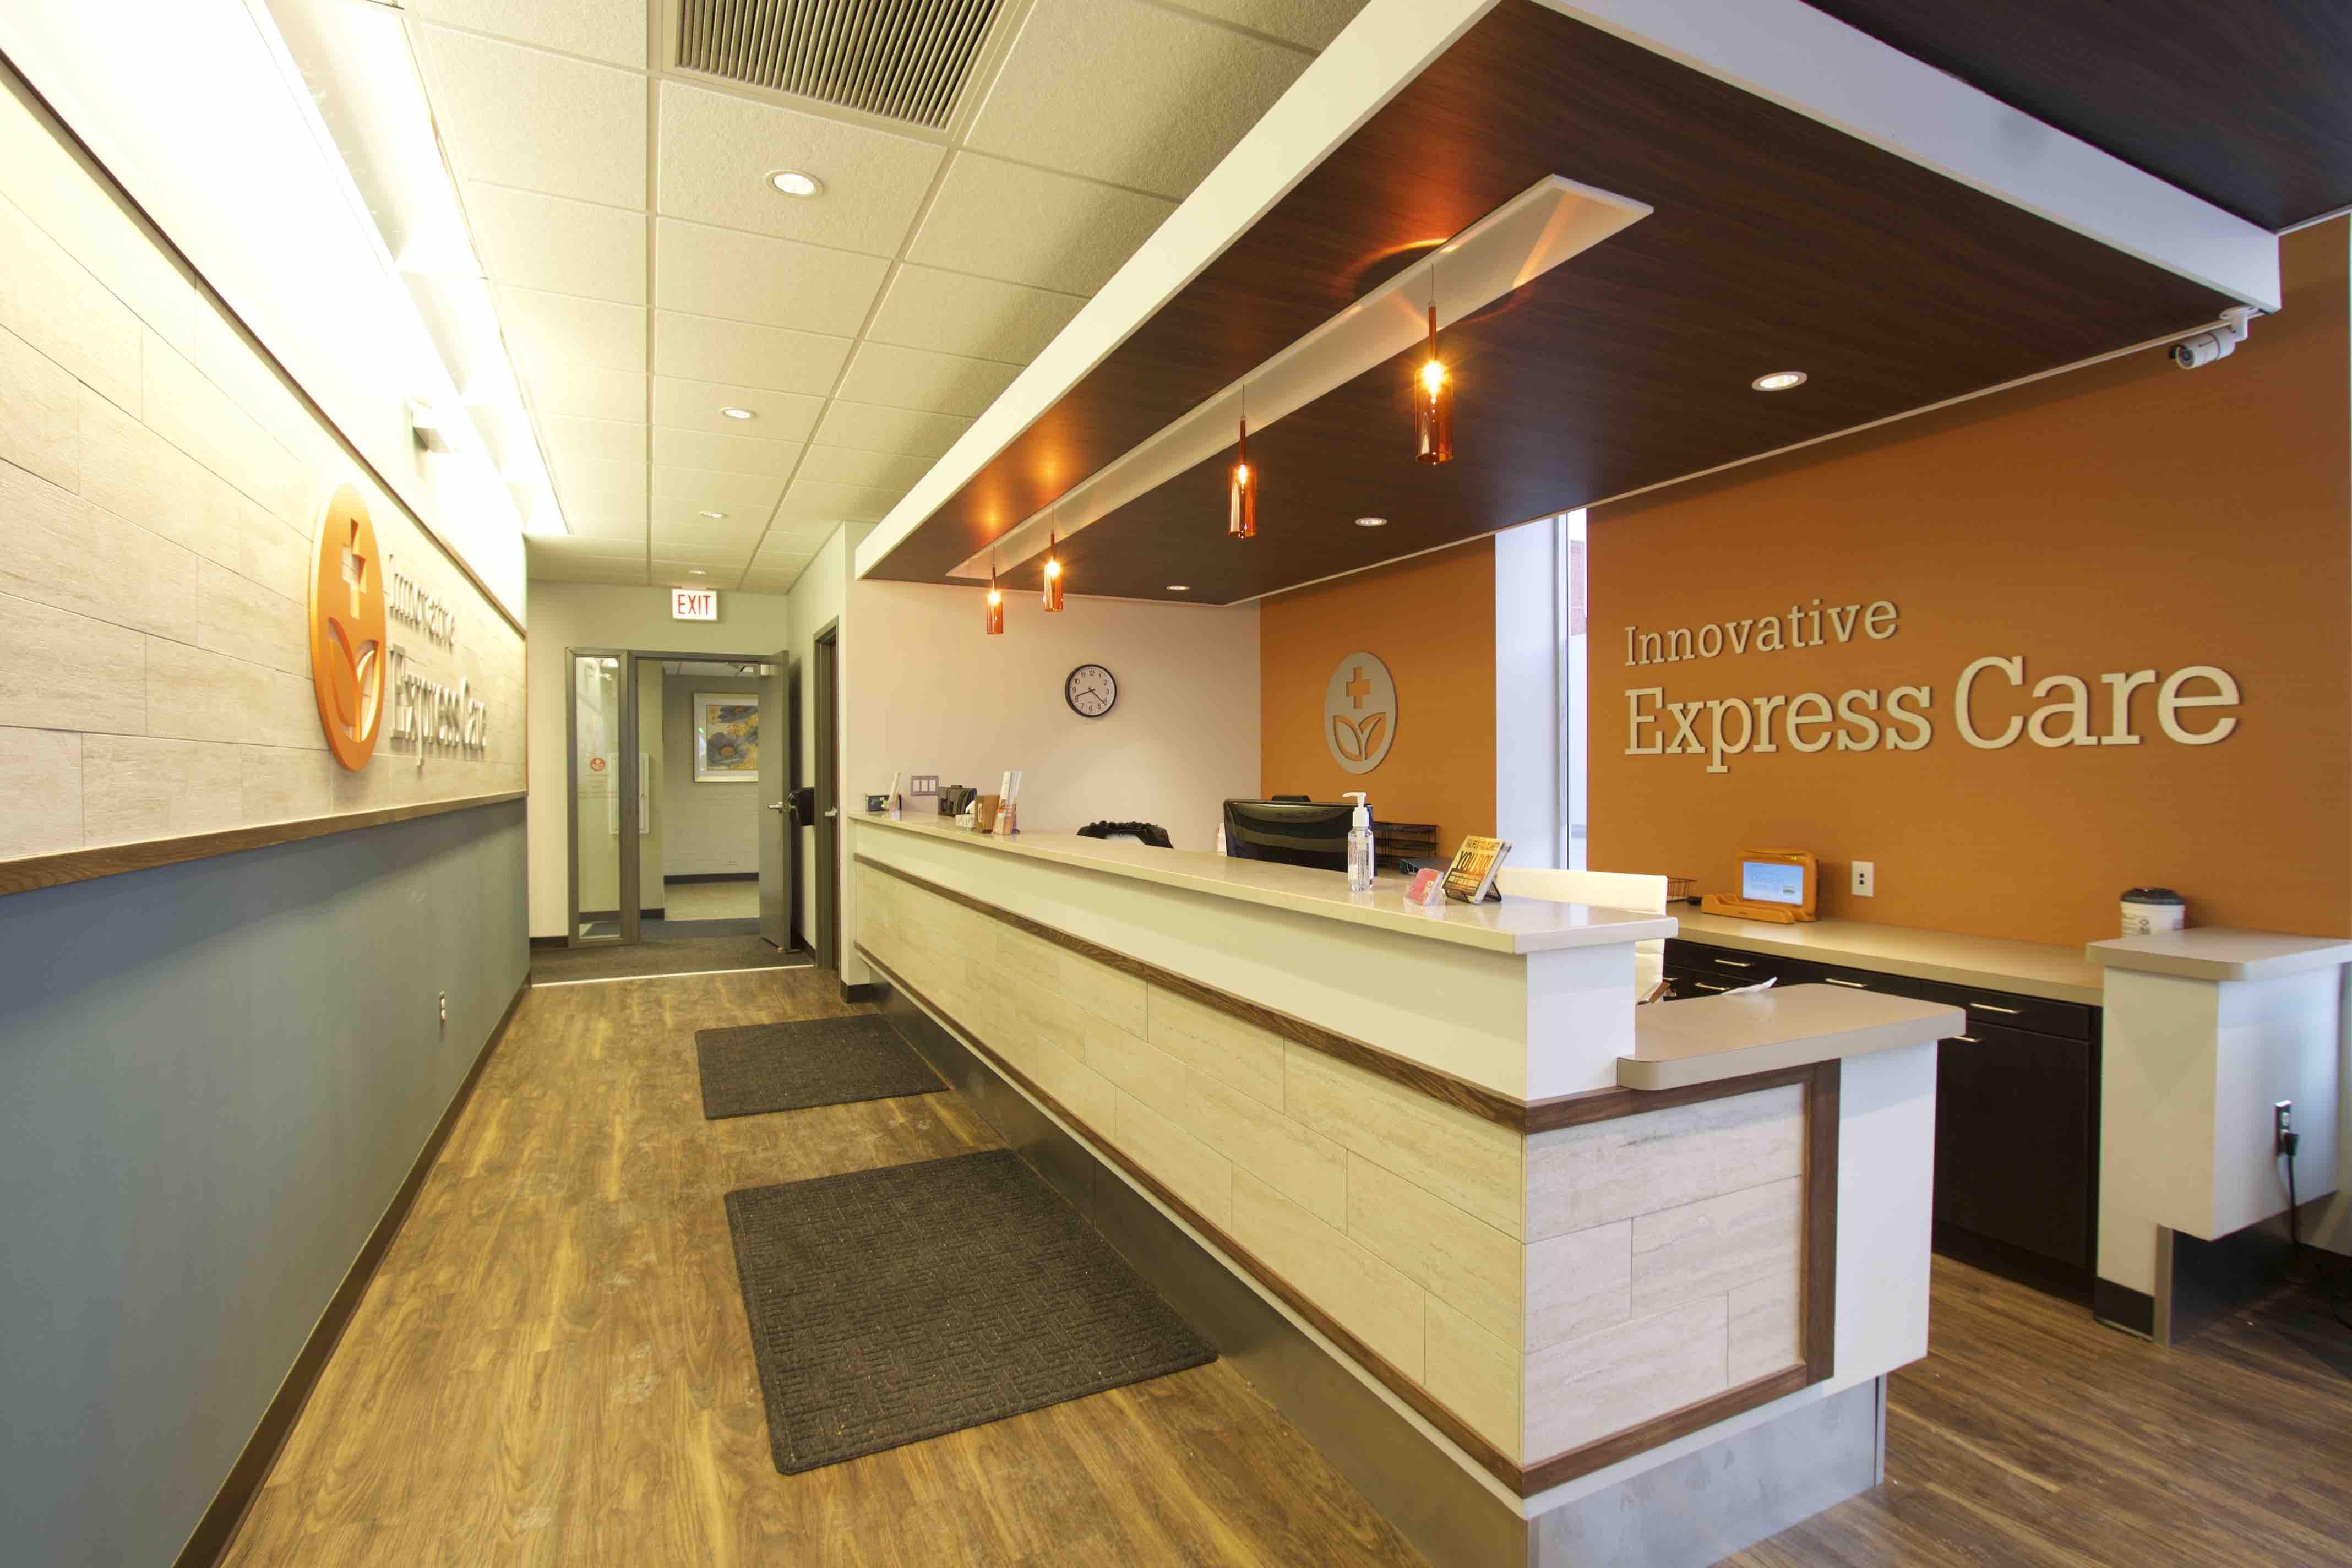 Innovative Express Care - Urgent Care Solv in Chicago, IL